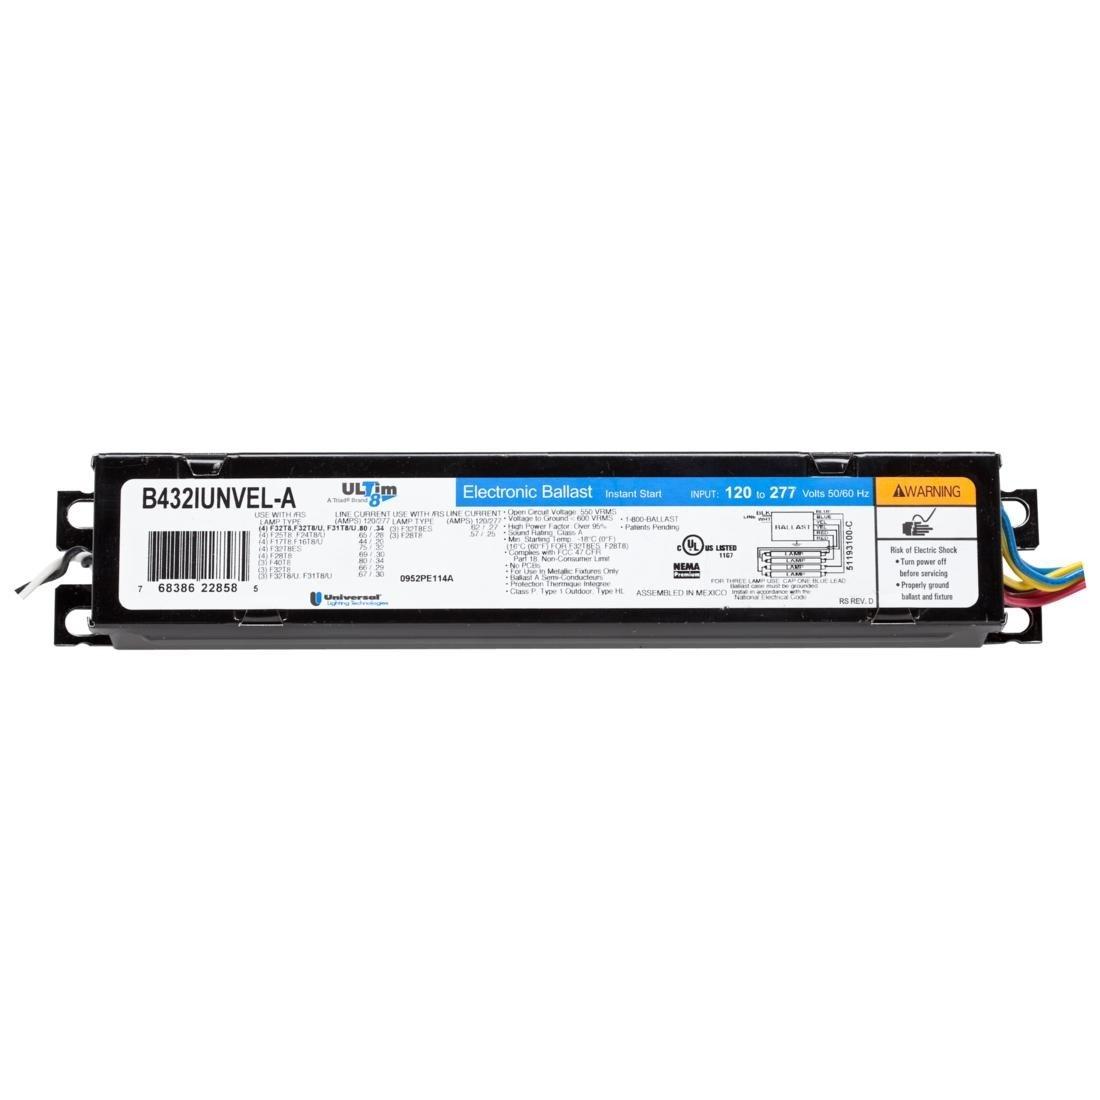 Universal Lighting Technologies B432IUNVEL-A010C Electronic Fluorescent Ballast, 120-277V, 3 Or 4 Lamp